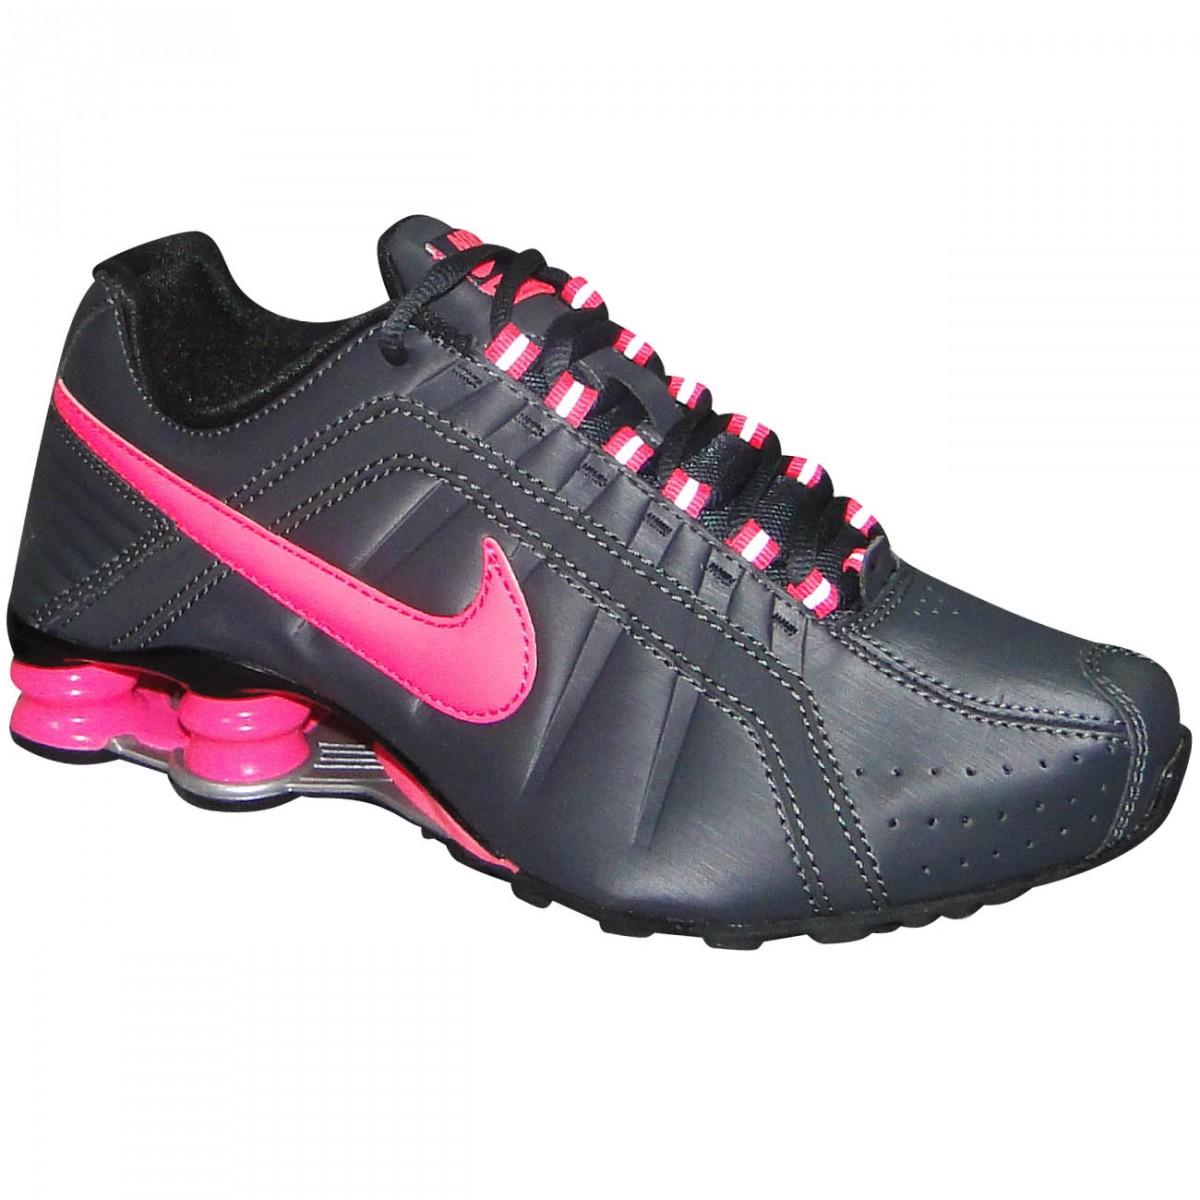 8c7b66f8ddf Tenis Nike Shox Junior 454339 011 - Grafite Pink - Chuteira Nike ...